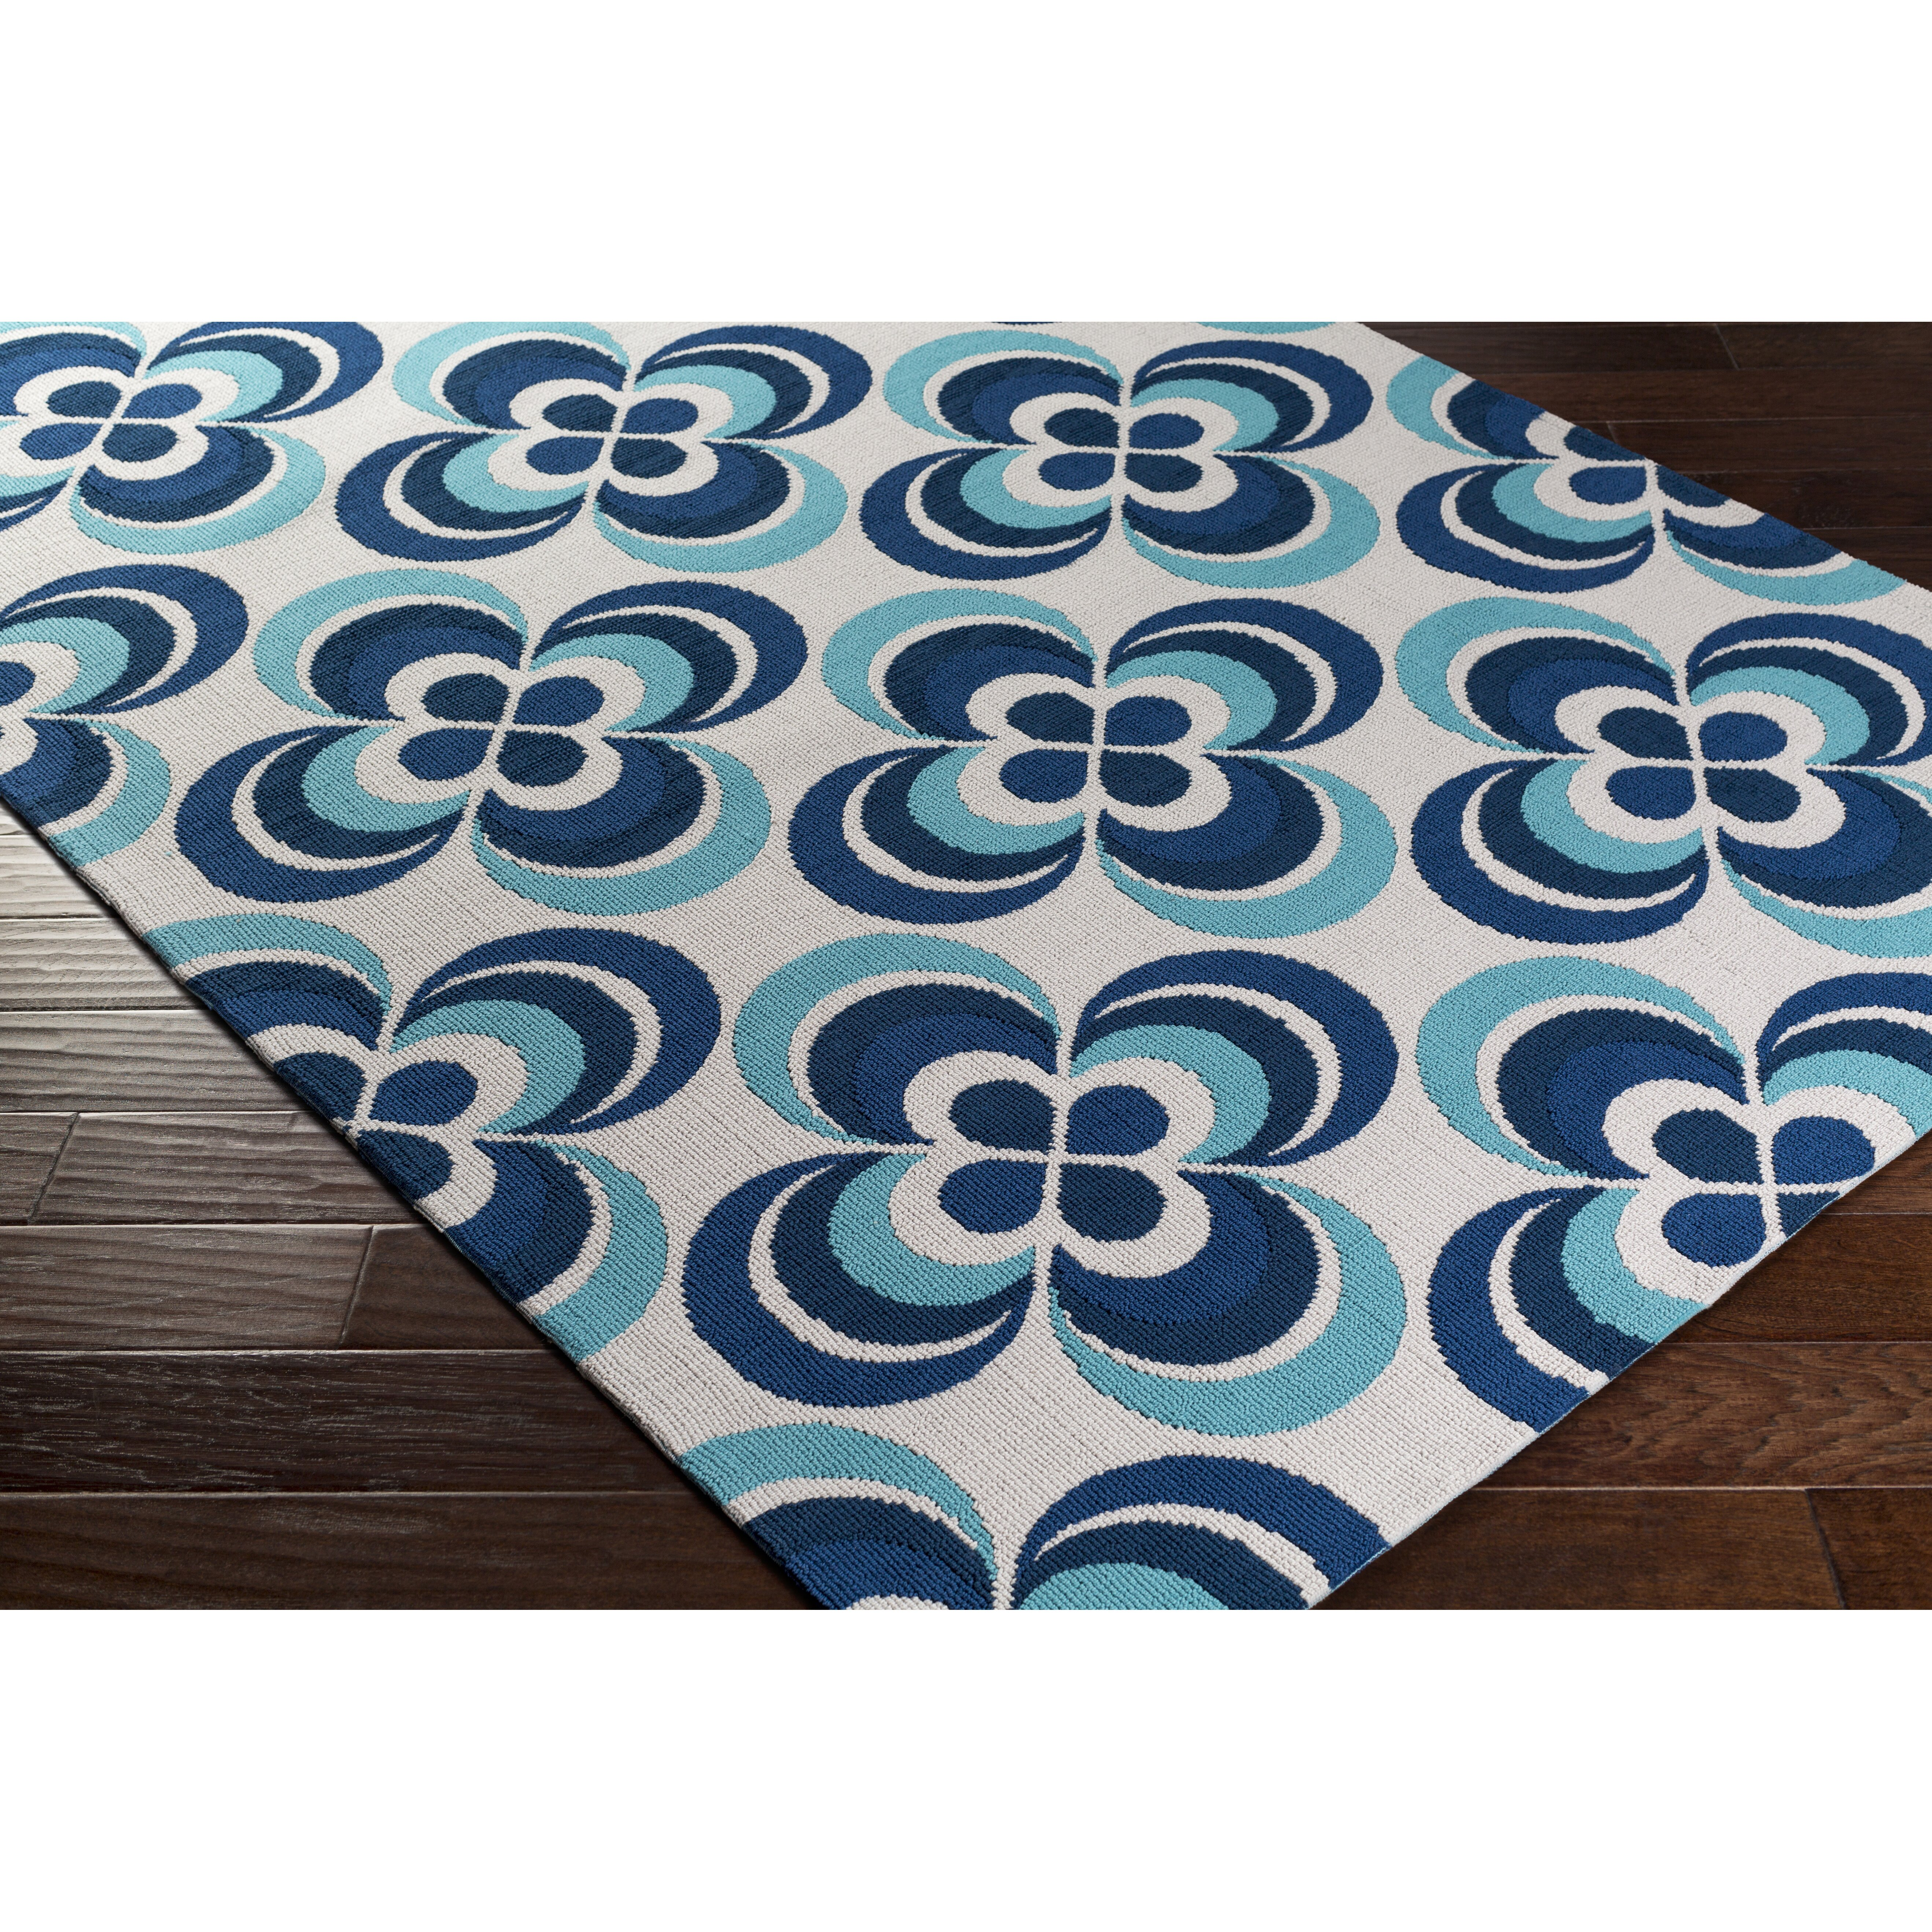 Artistic Weavers Joan Everston Navy Blue/Aqua Area Rug